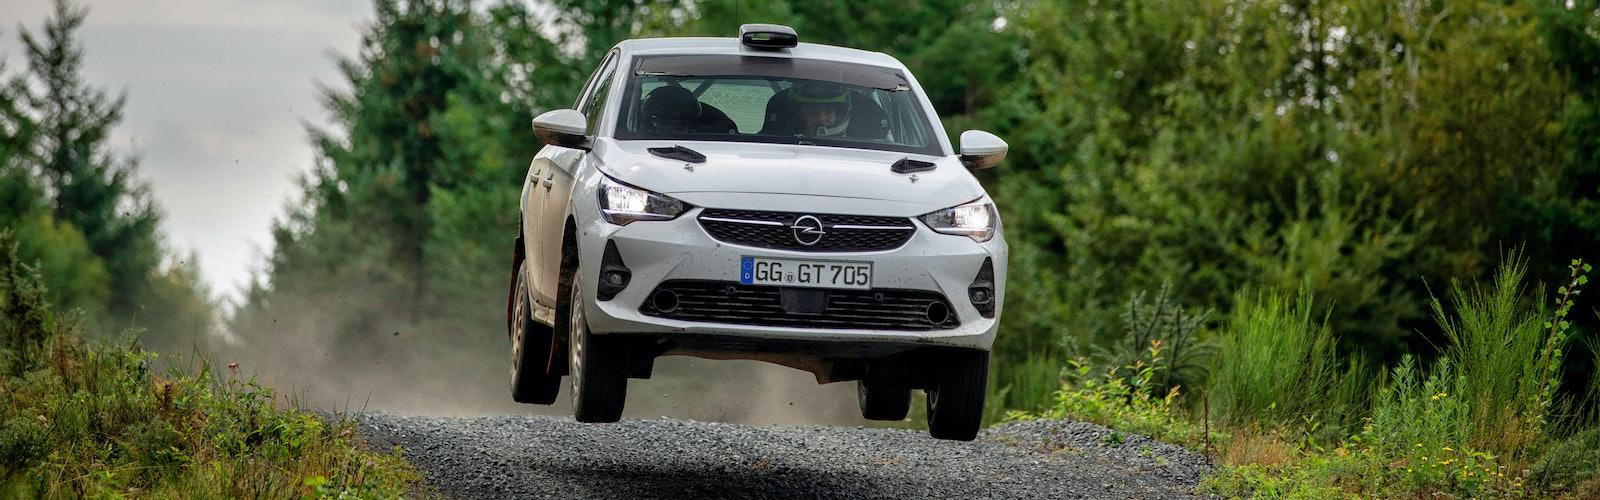 Testfahrten Opel Corsa R4, 10./11. September 2020 in Frankreich